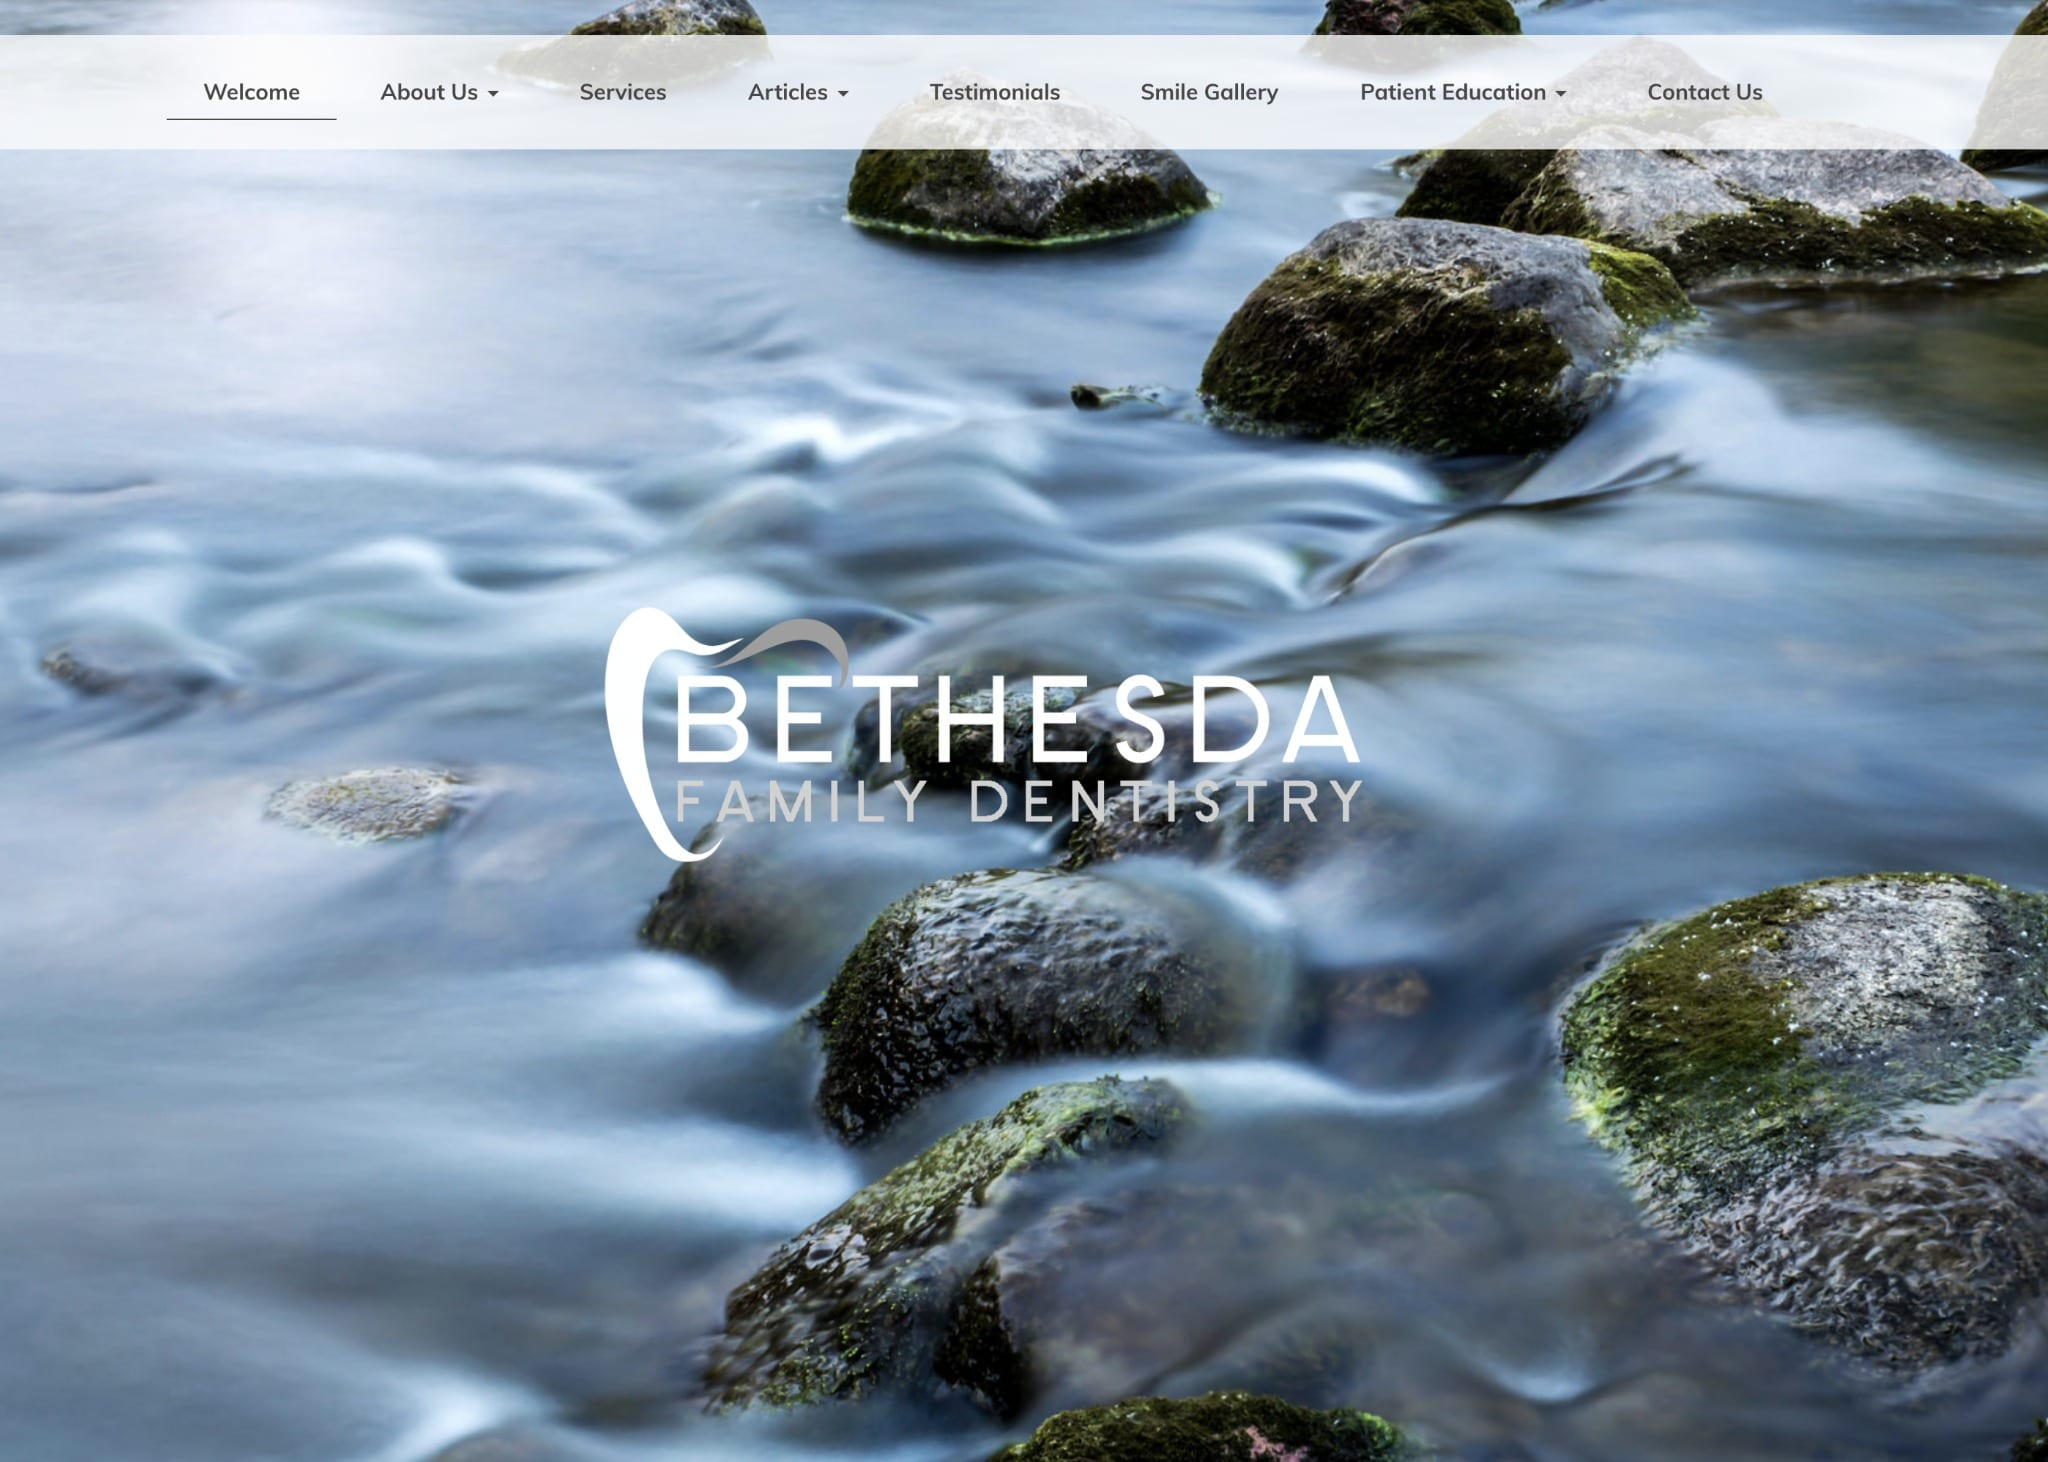 bethesta dental website